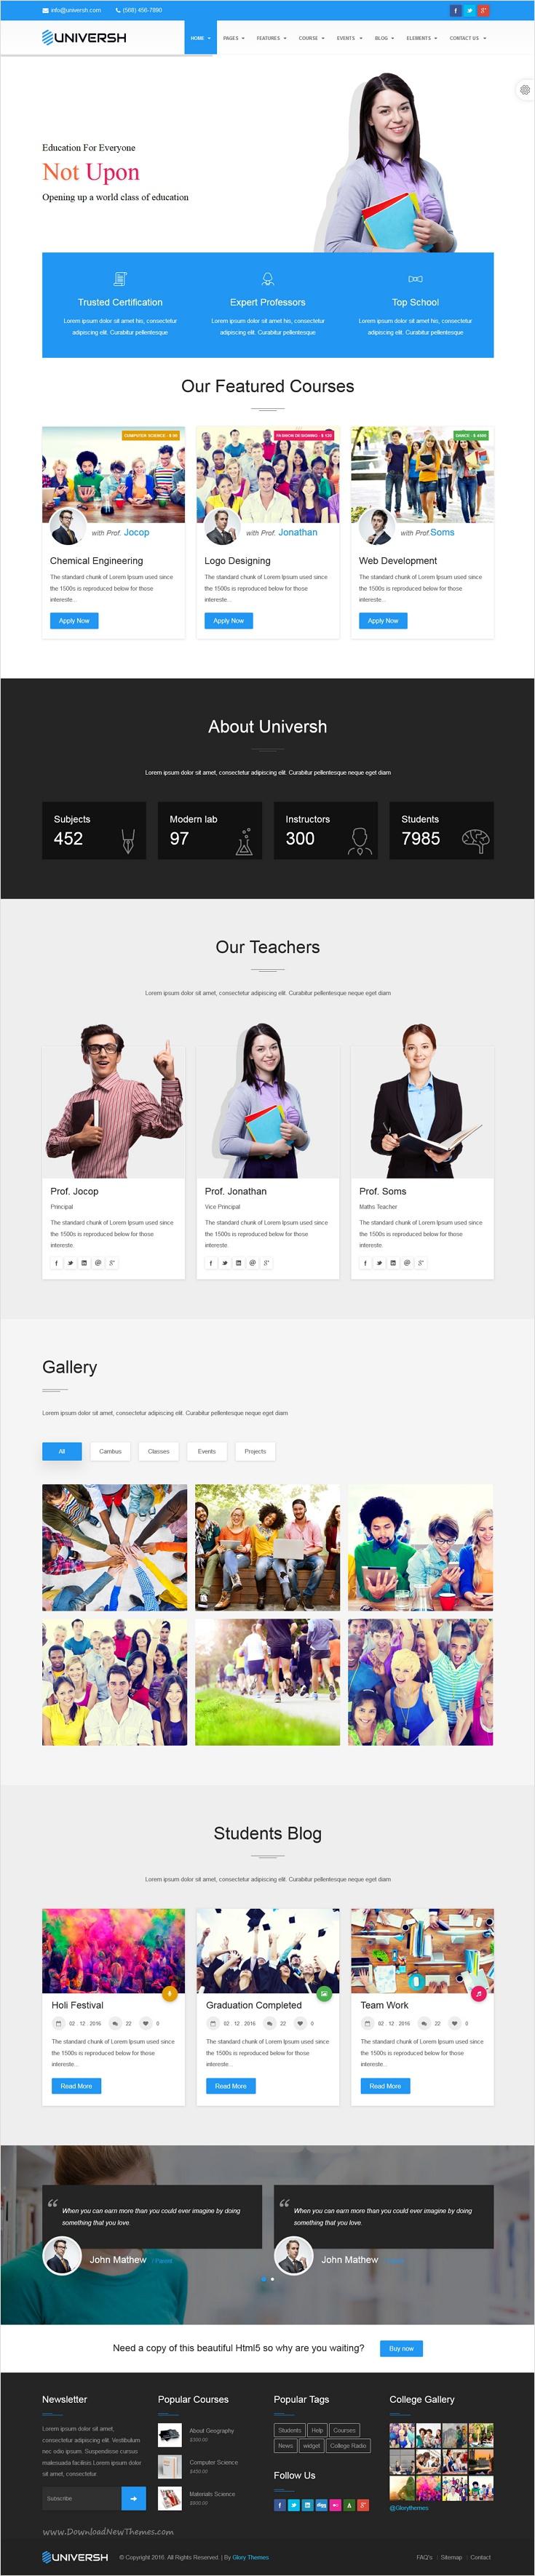 Universh is a professional Business & Educational Joomla template